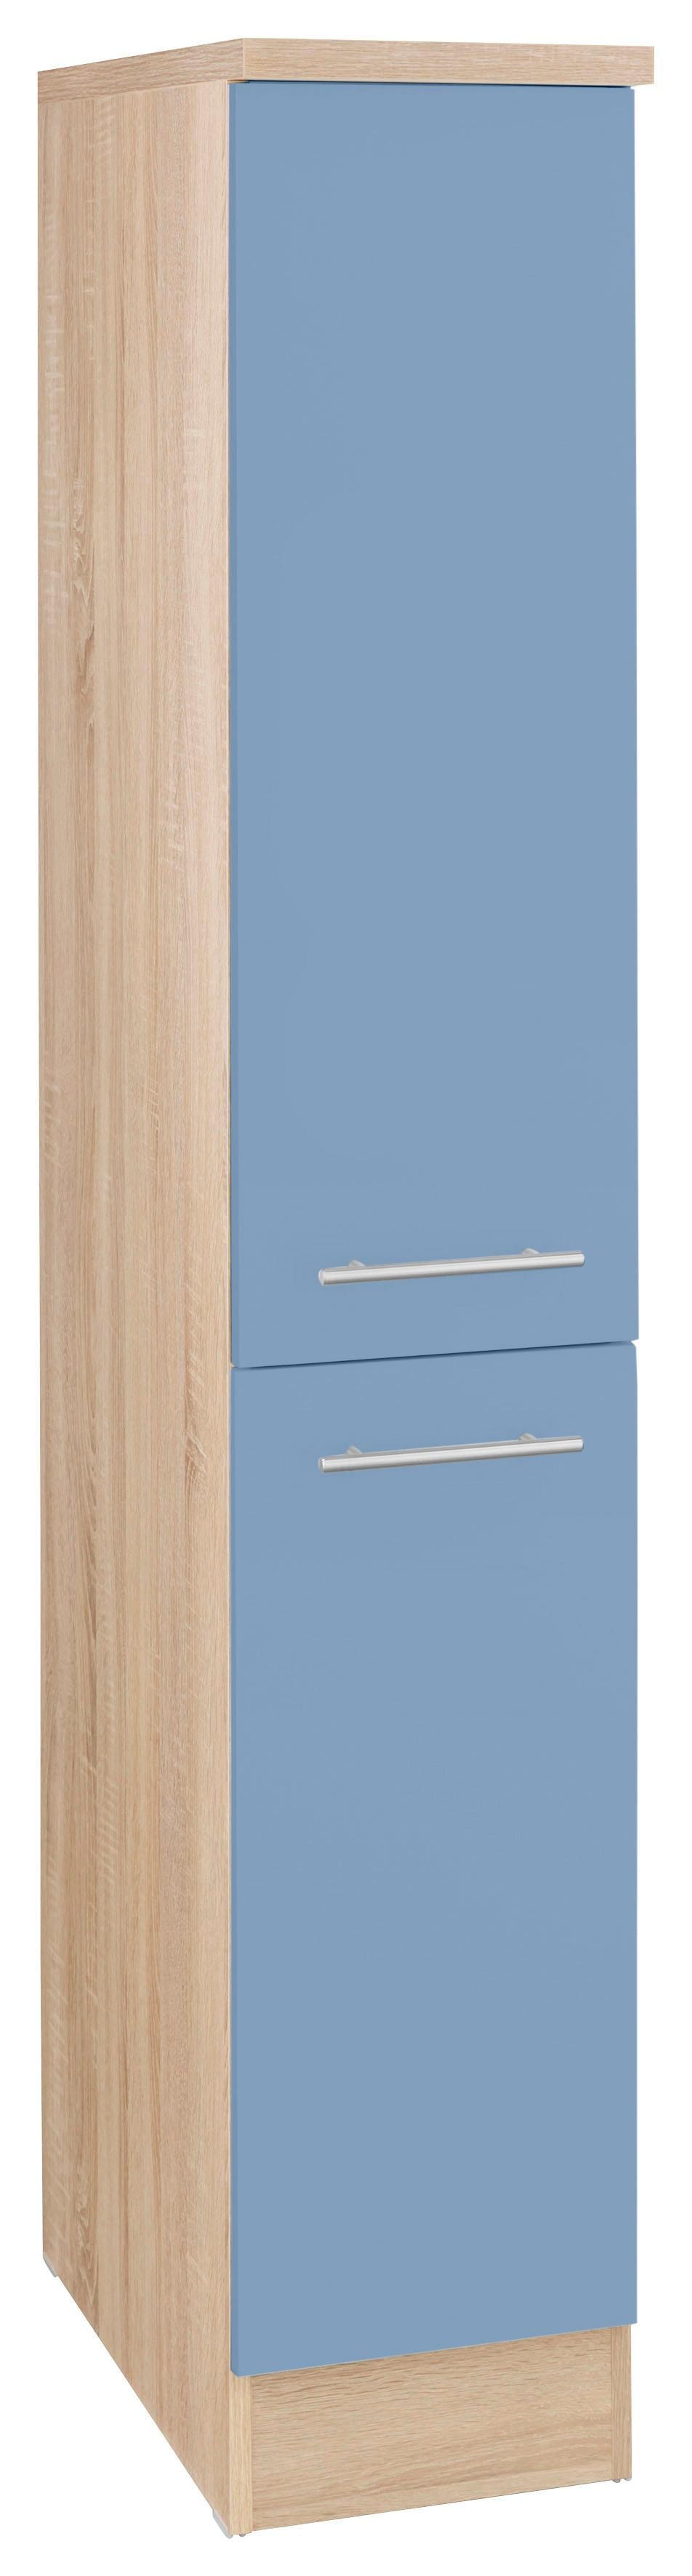 OPTIFIT Midi-Apothekerschrank Kalmar   Küche und Esszimmer > Küchenschränke > Apothekerschränke   Blau   Nachbildung - Edelstahl - Eiche - Melamin   Optifit